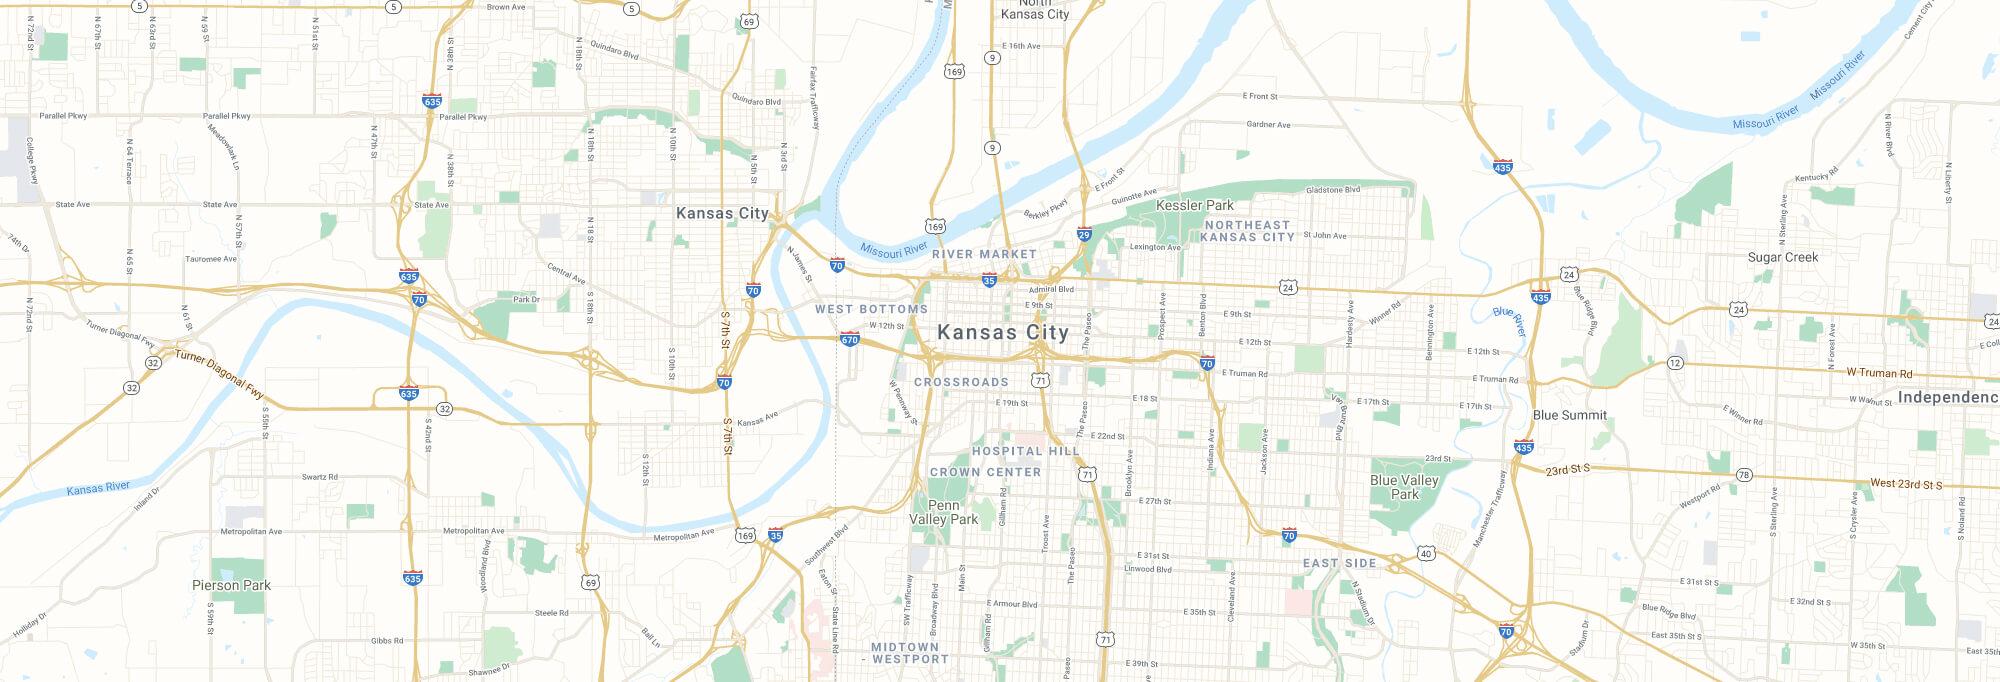 Kansas City city map